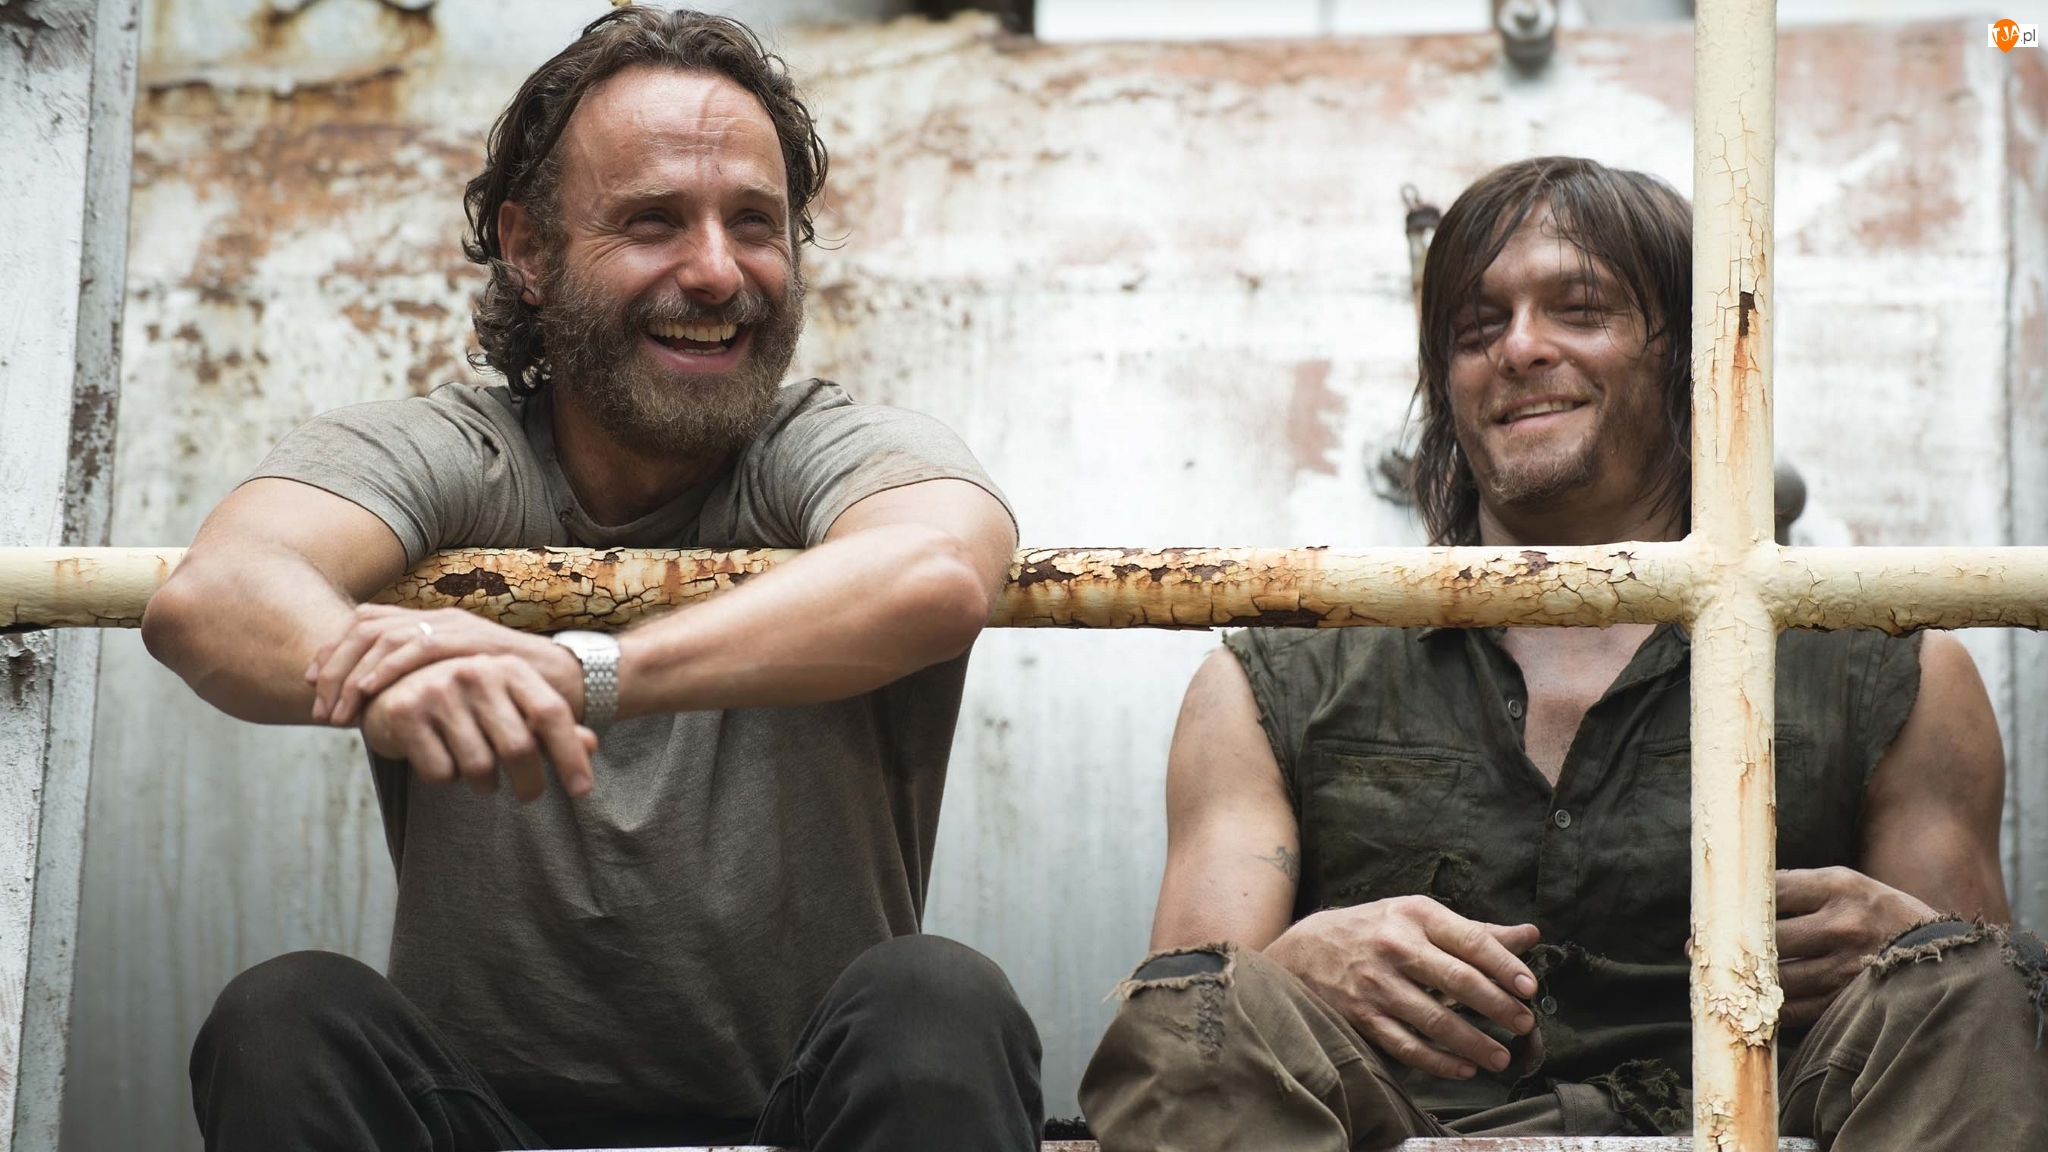 Aktorzy, Serial, Rick Grimes, Andrew Lincoln, Żywe trupy, Daryl Dixon, Norman Reedus, The Walking Dead